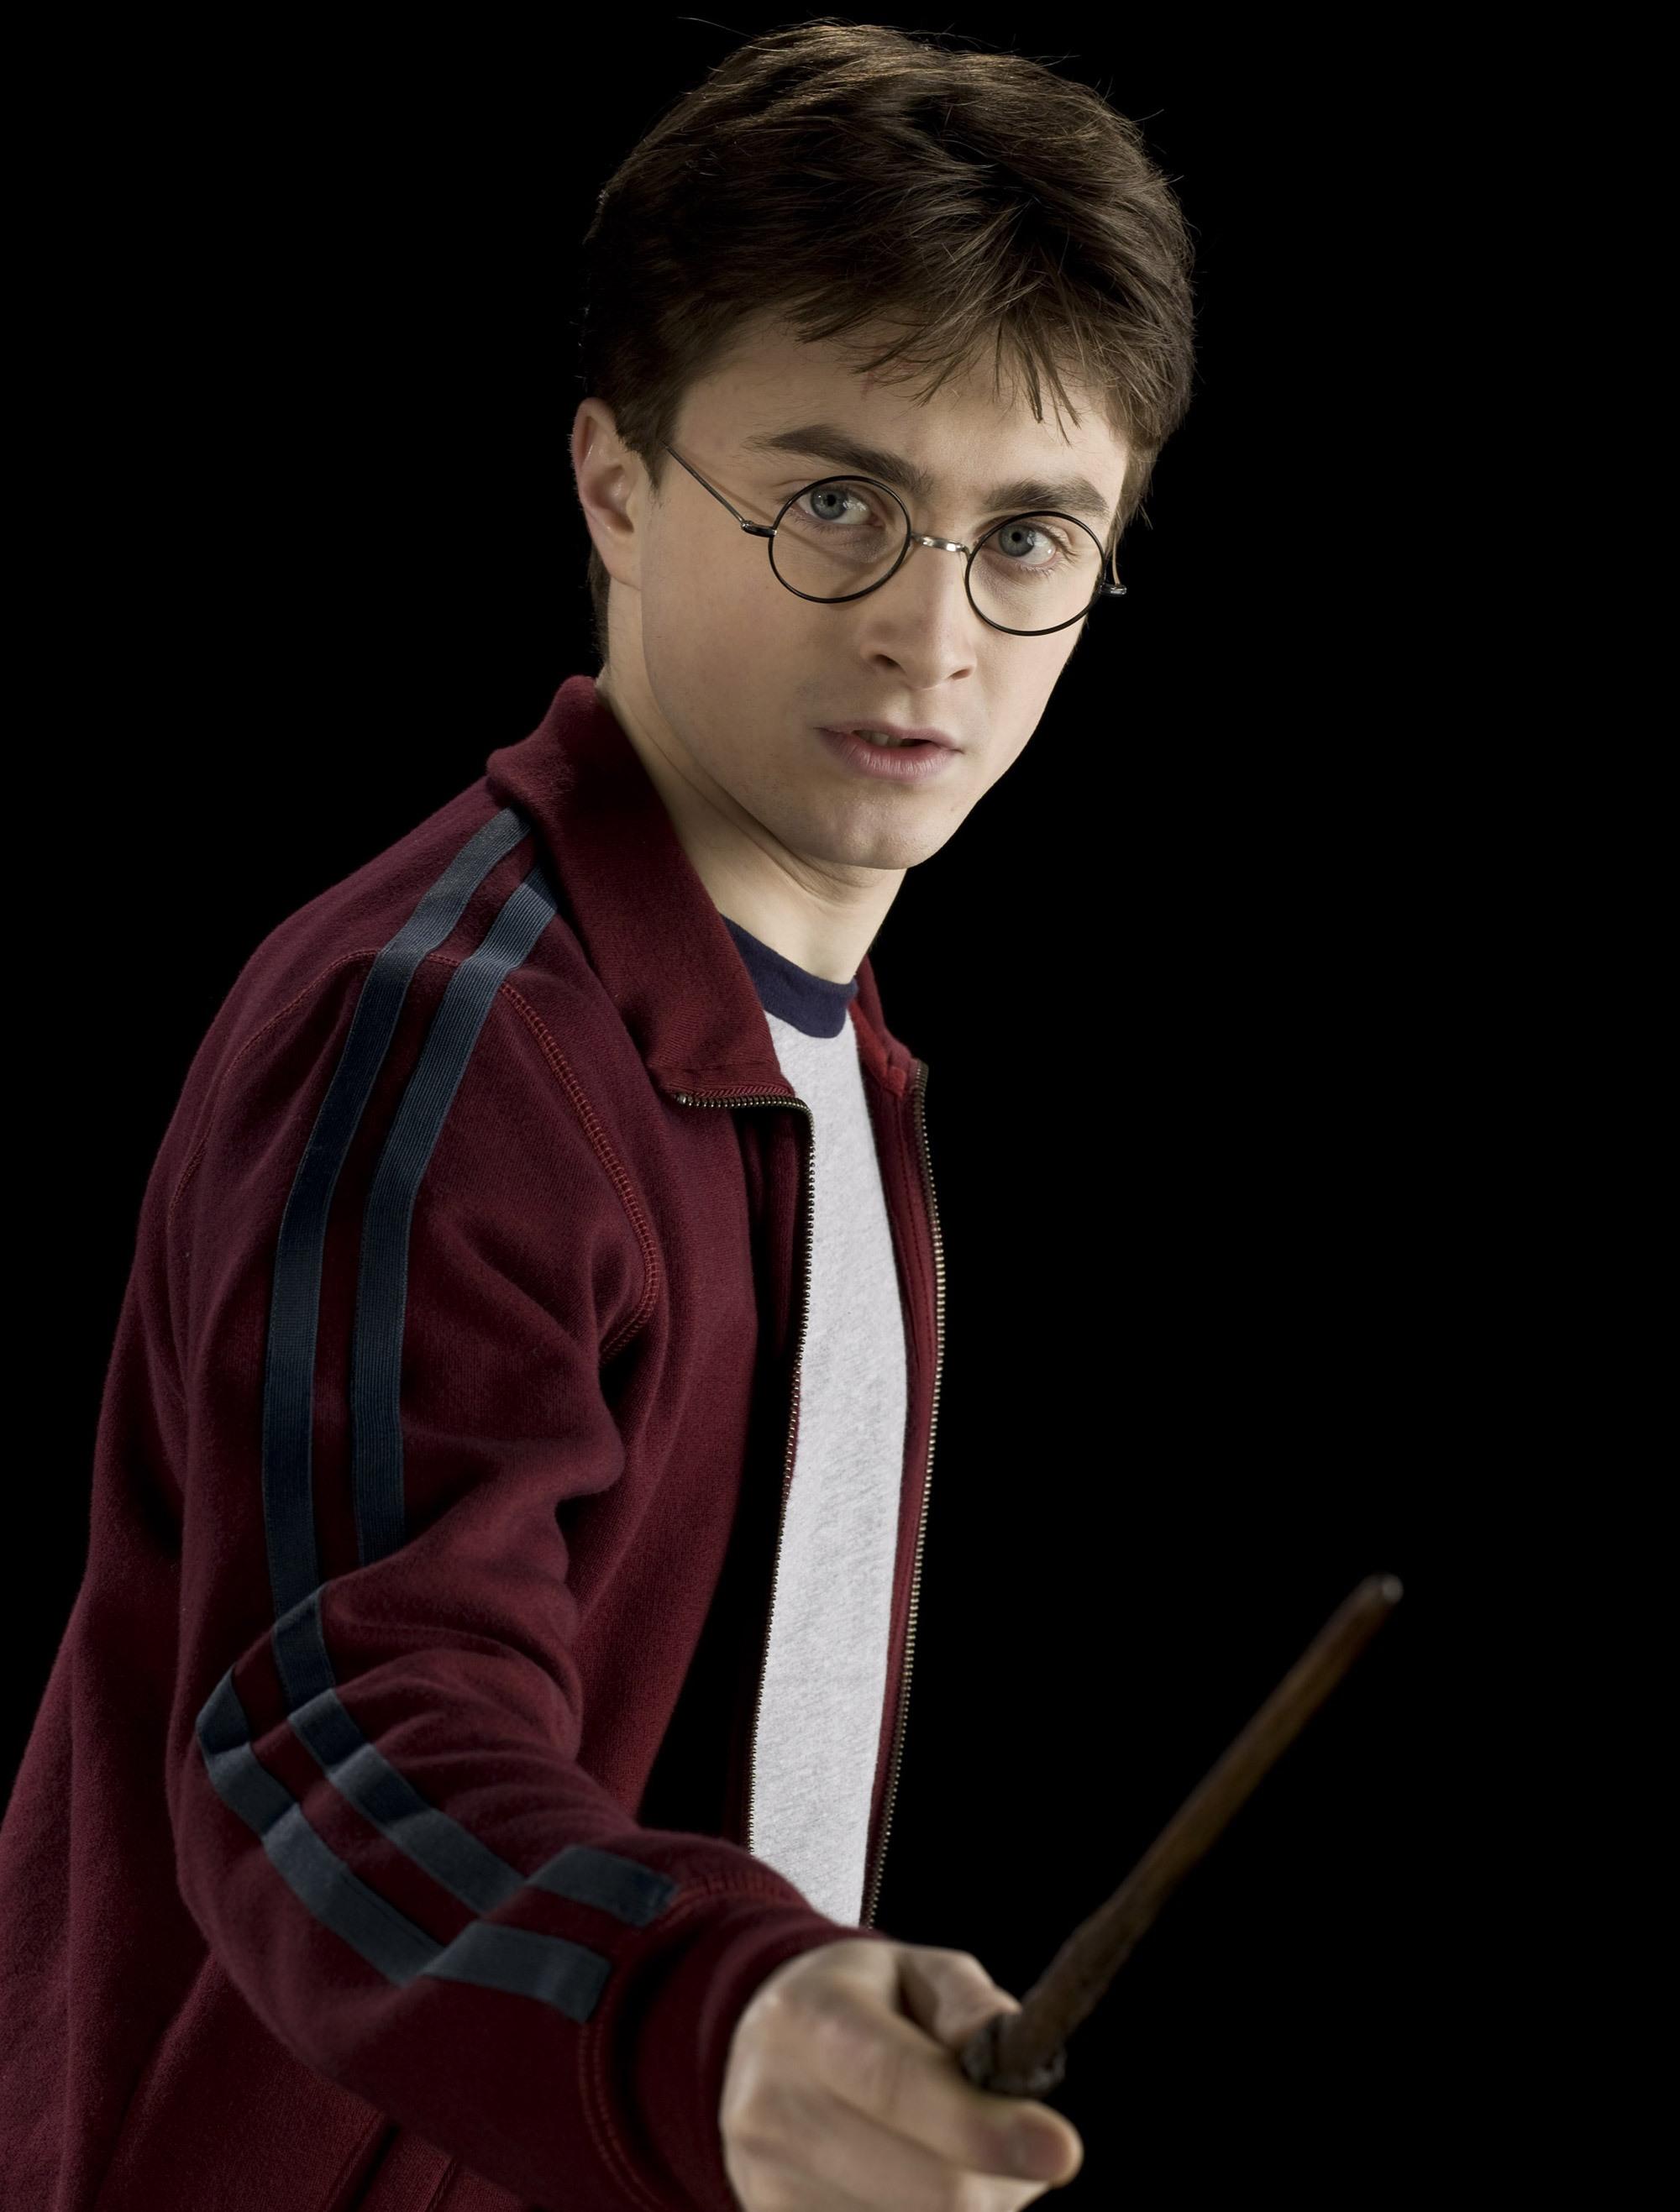 Harry Potter Book Wiki : Image harry potter hbp promo g wiki